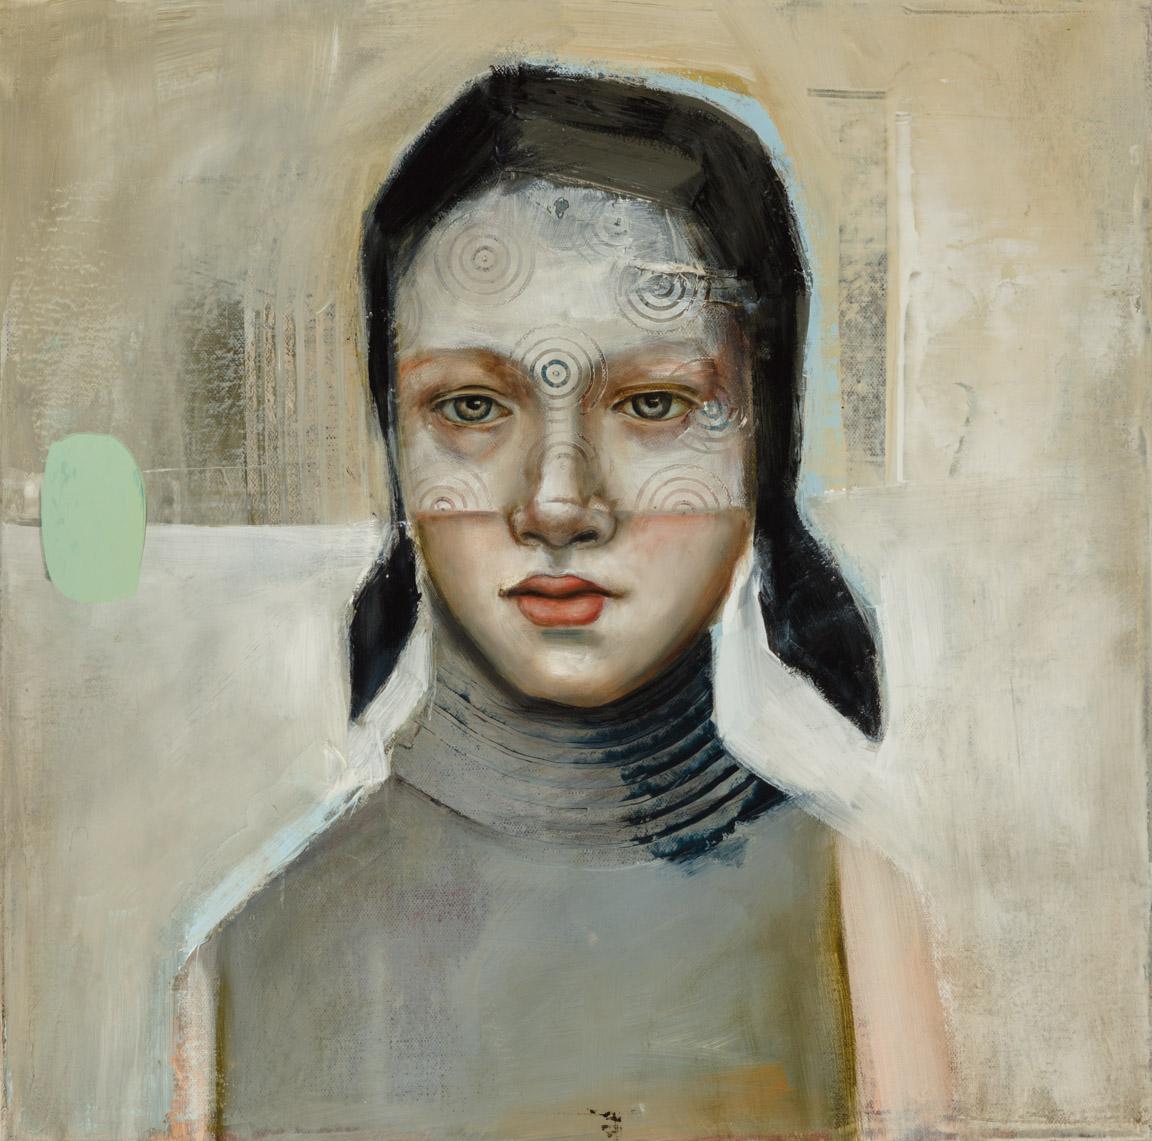 "Hidden  - Oil on canvas - 15"" x 15"" / 38 x 38 cm - SOLD"